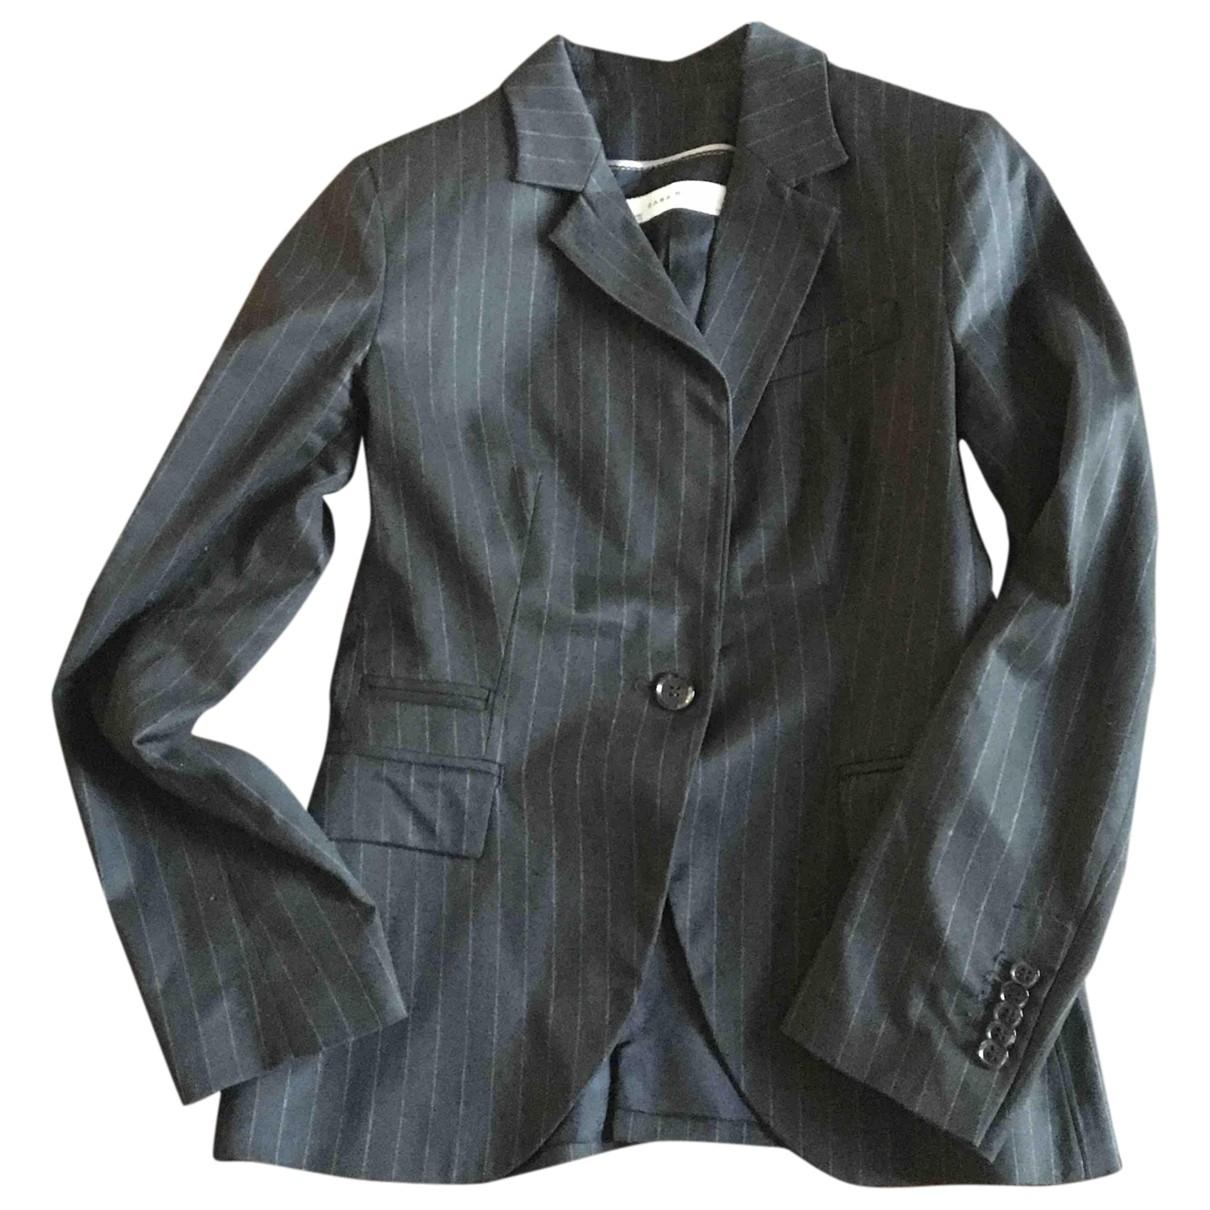 Zara \N Jacke in  Anthrazit Polyester